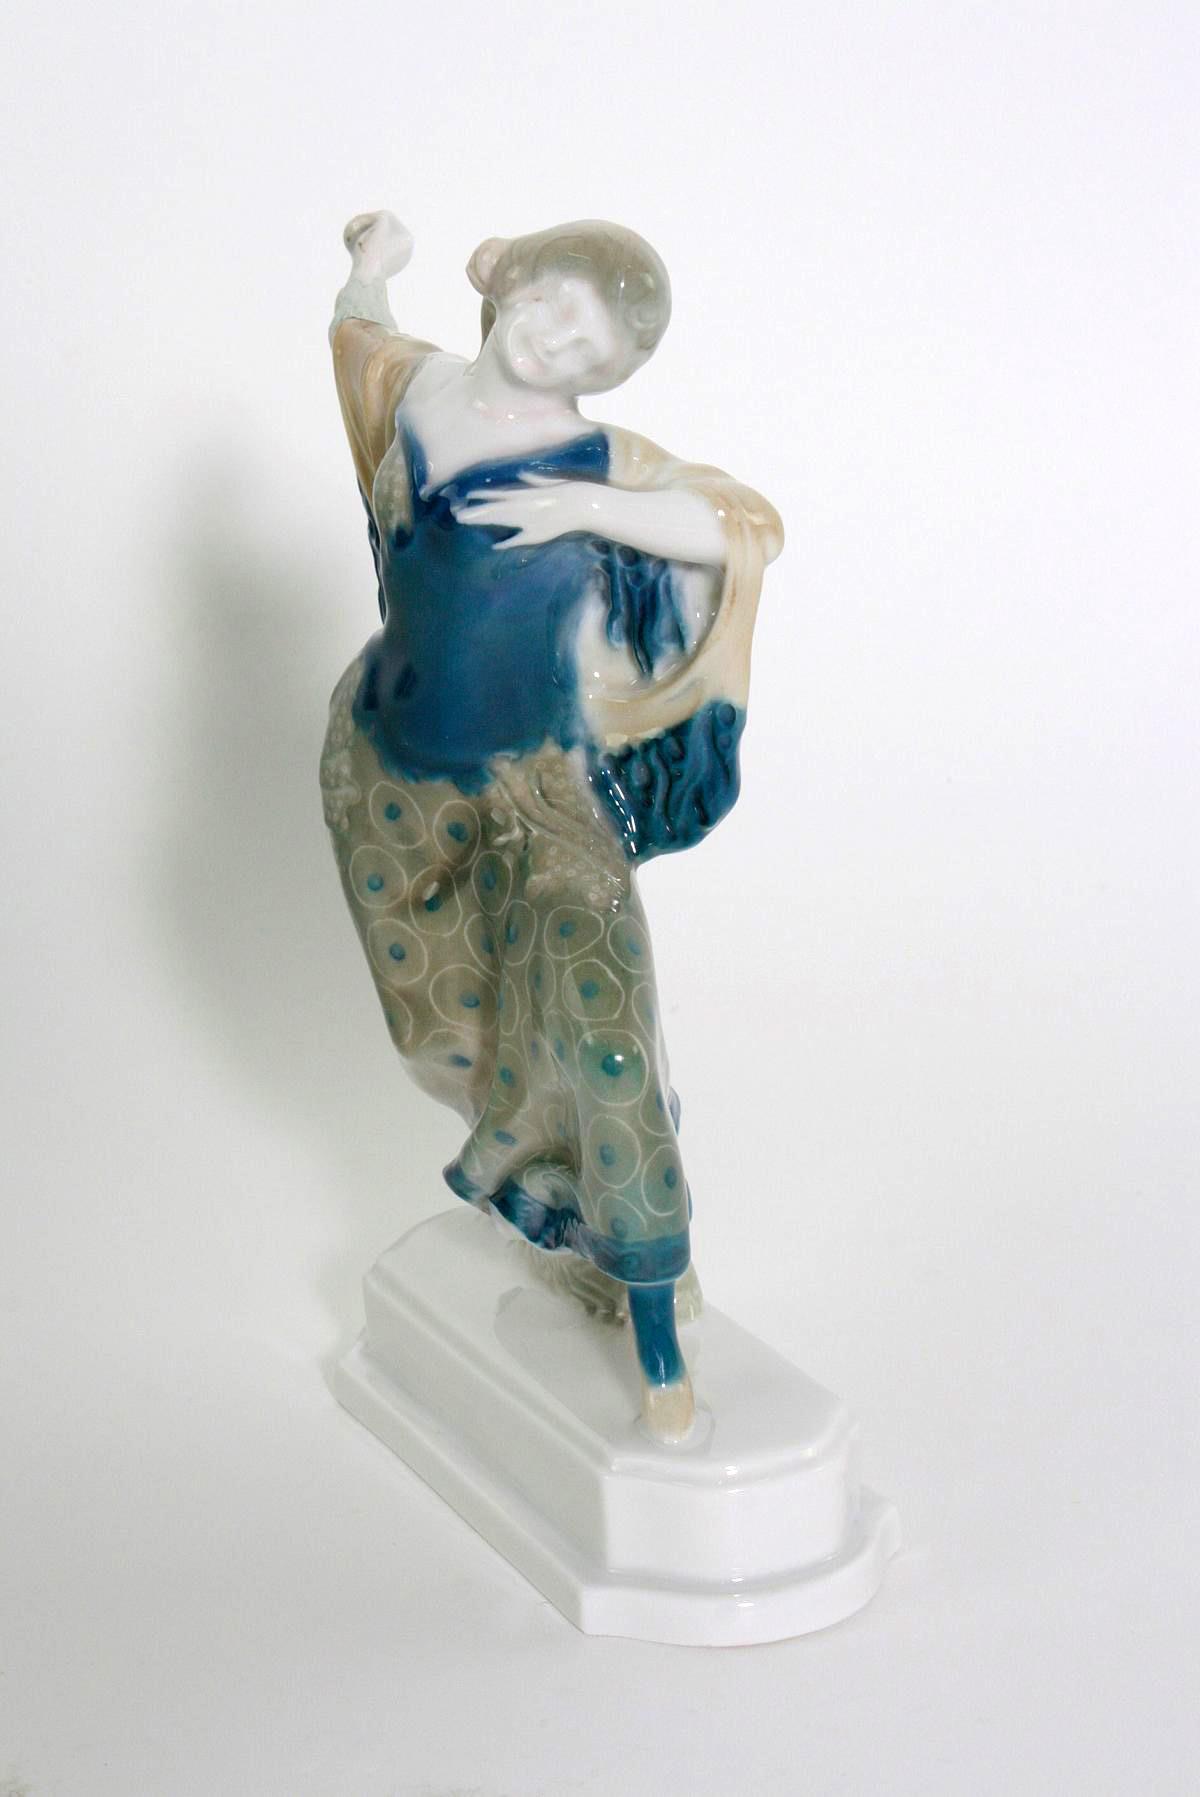 Porzellanskulptur, 'Tänzerin, Carmen', Rosenthal, Kunst-Abteilung, 1920er Jahre-4